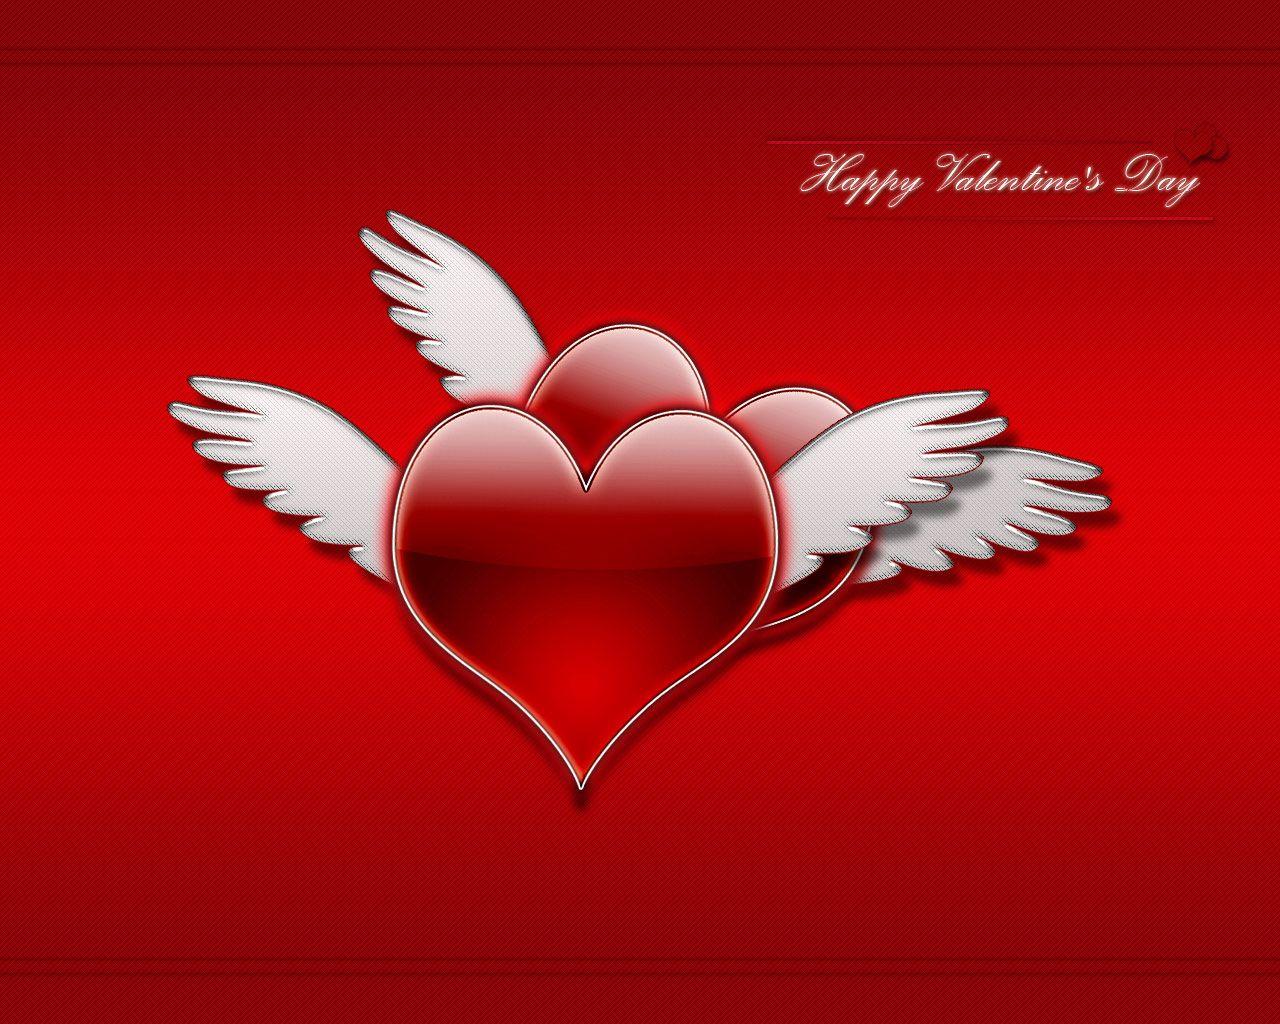 happy valentines day wallpaper 10 happy valentines day wallpaper 11 1280x1024